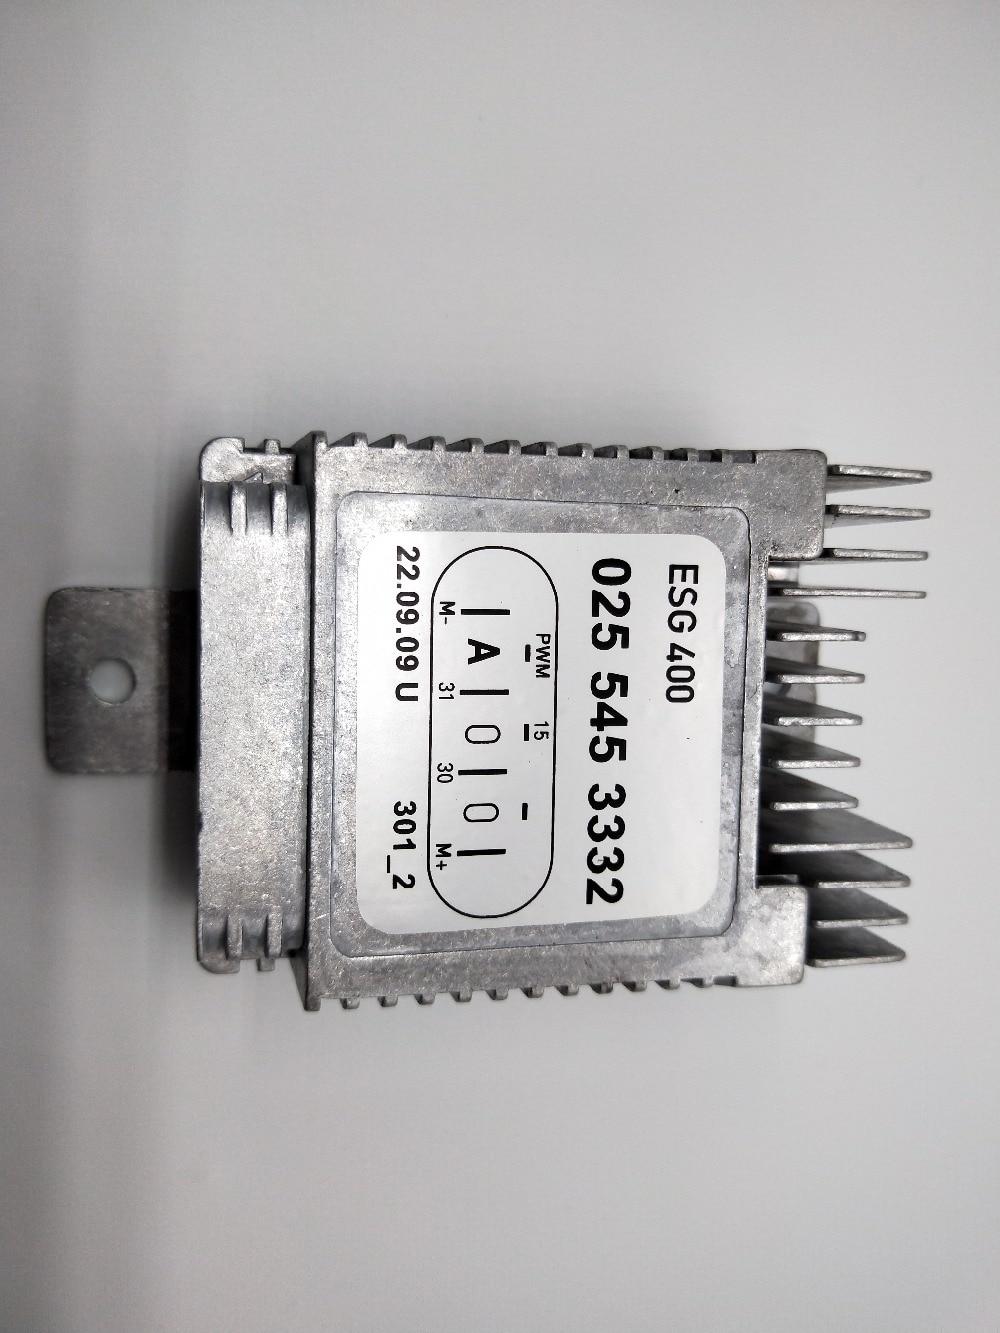 Lüfter Innenraumgebläse Regler Widerstand MERCEDES E200 E220 E230 E320 E430 E55